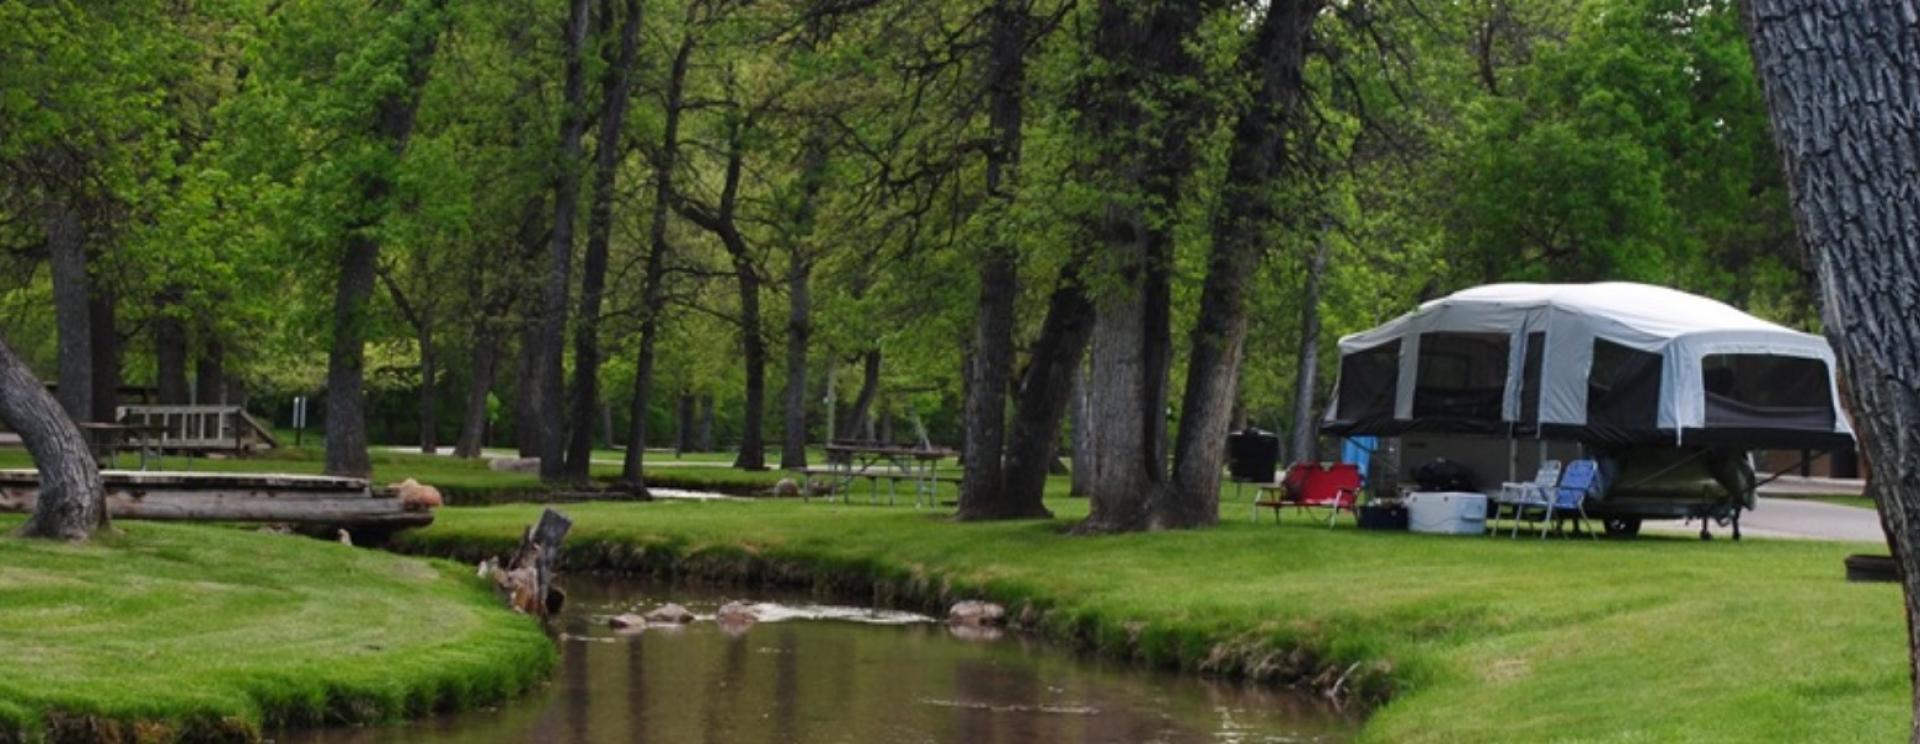 Spearfish City Campground